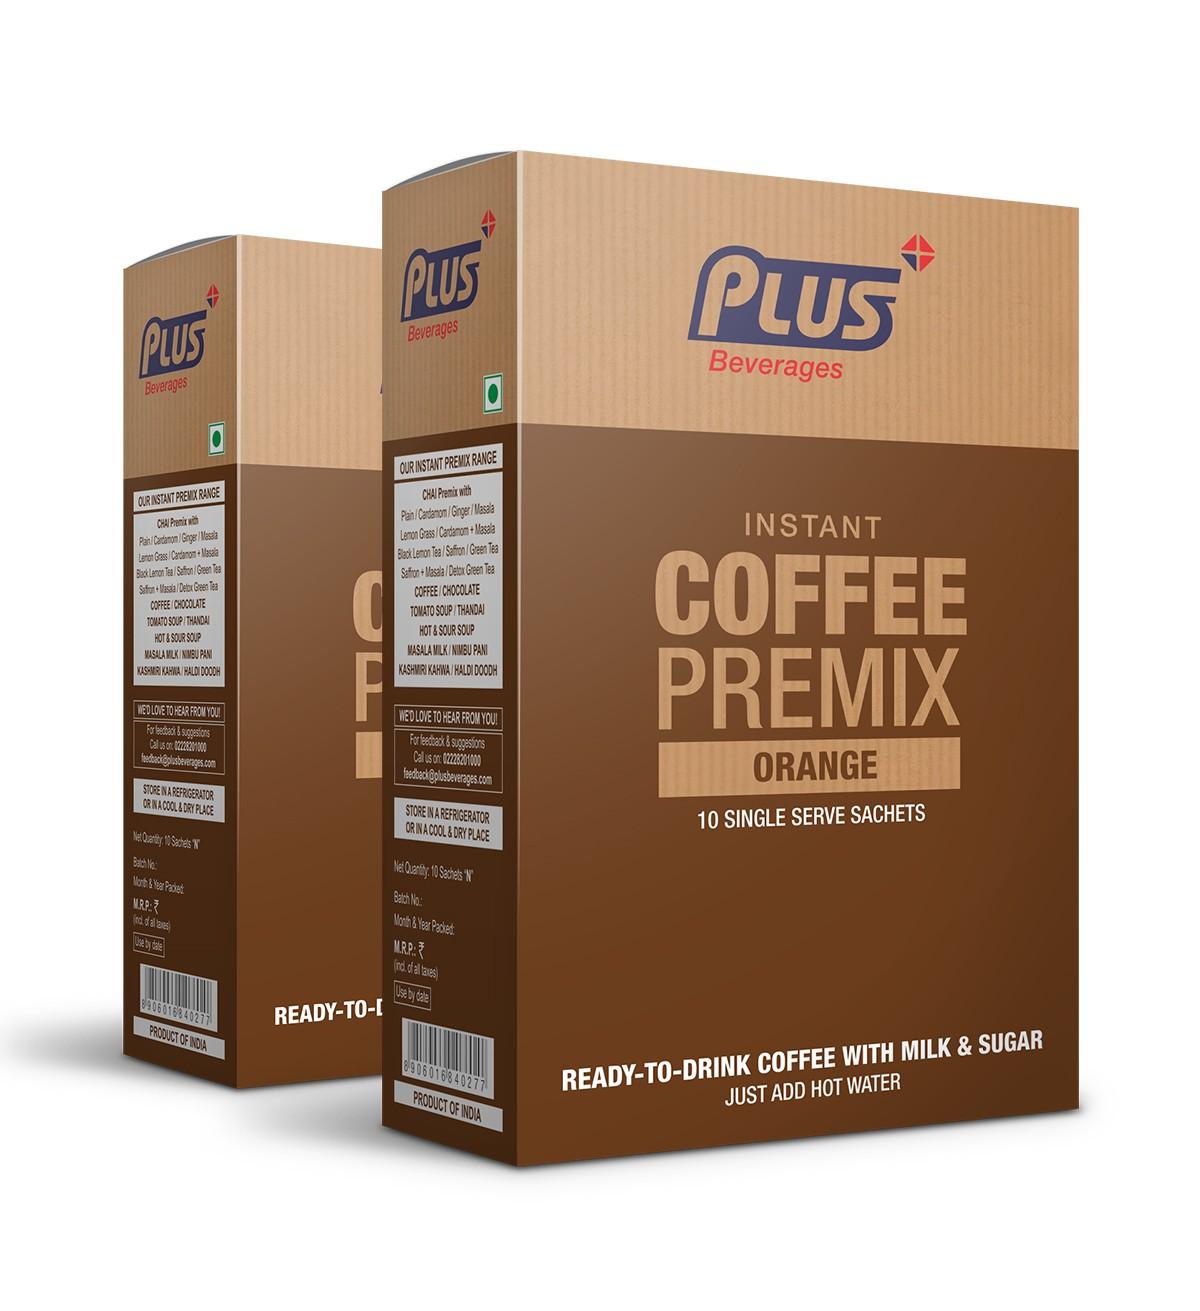 Get Instant Orange Coffee Premix at best price - Free Shipping | Plus Beverages